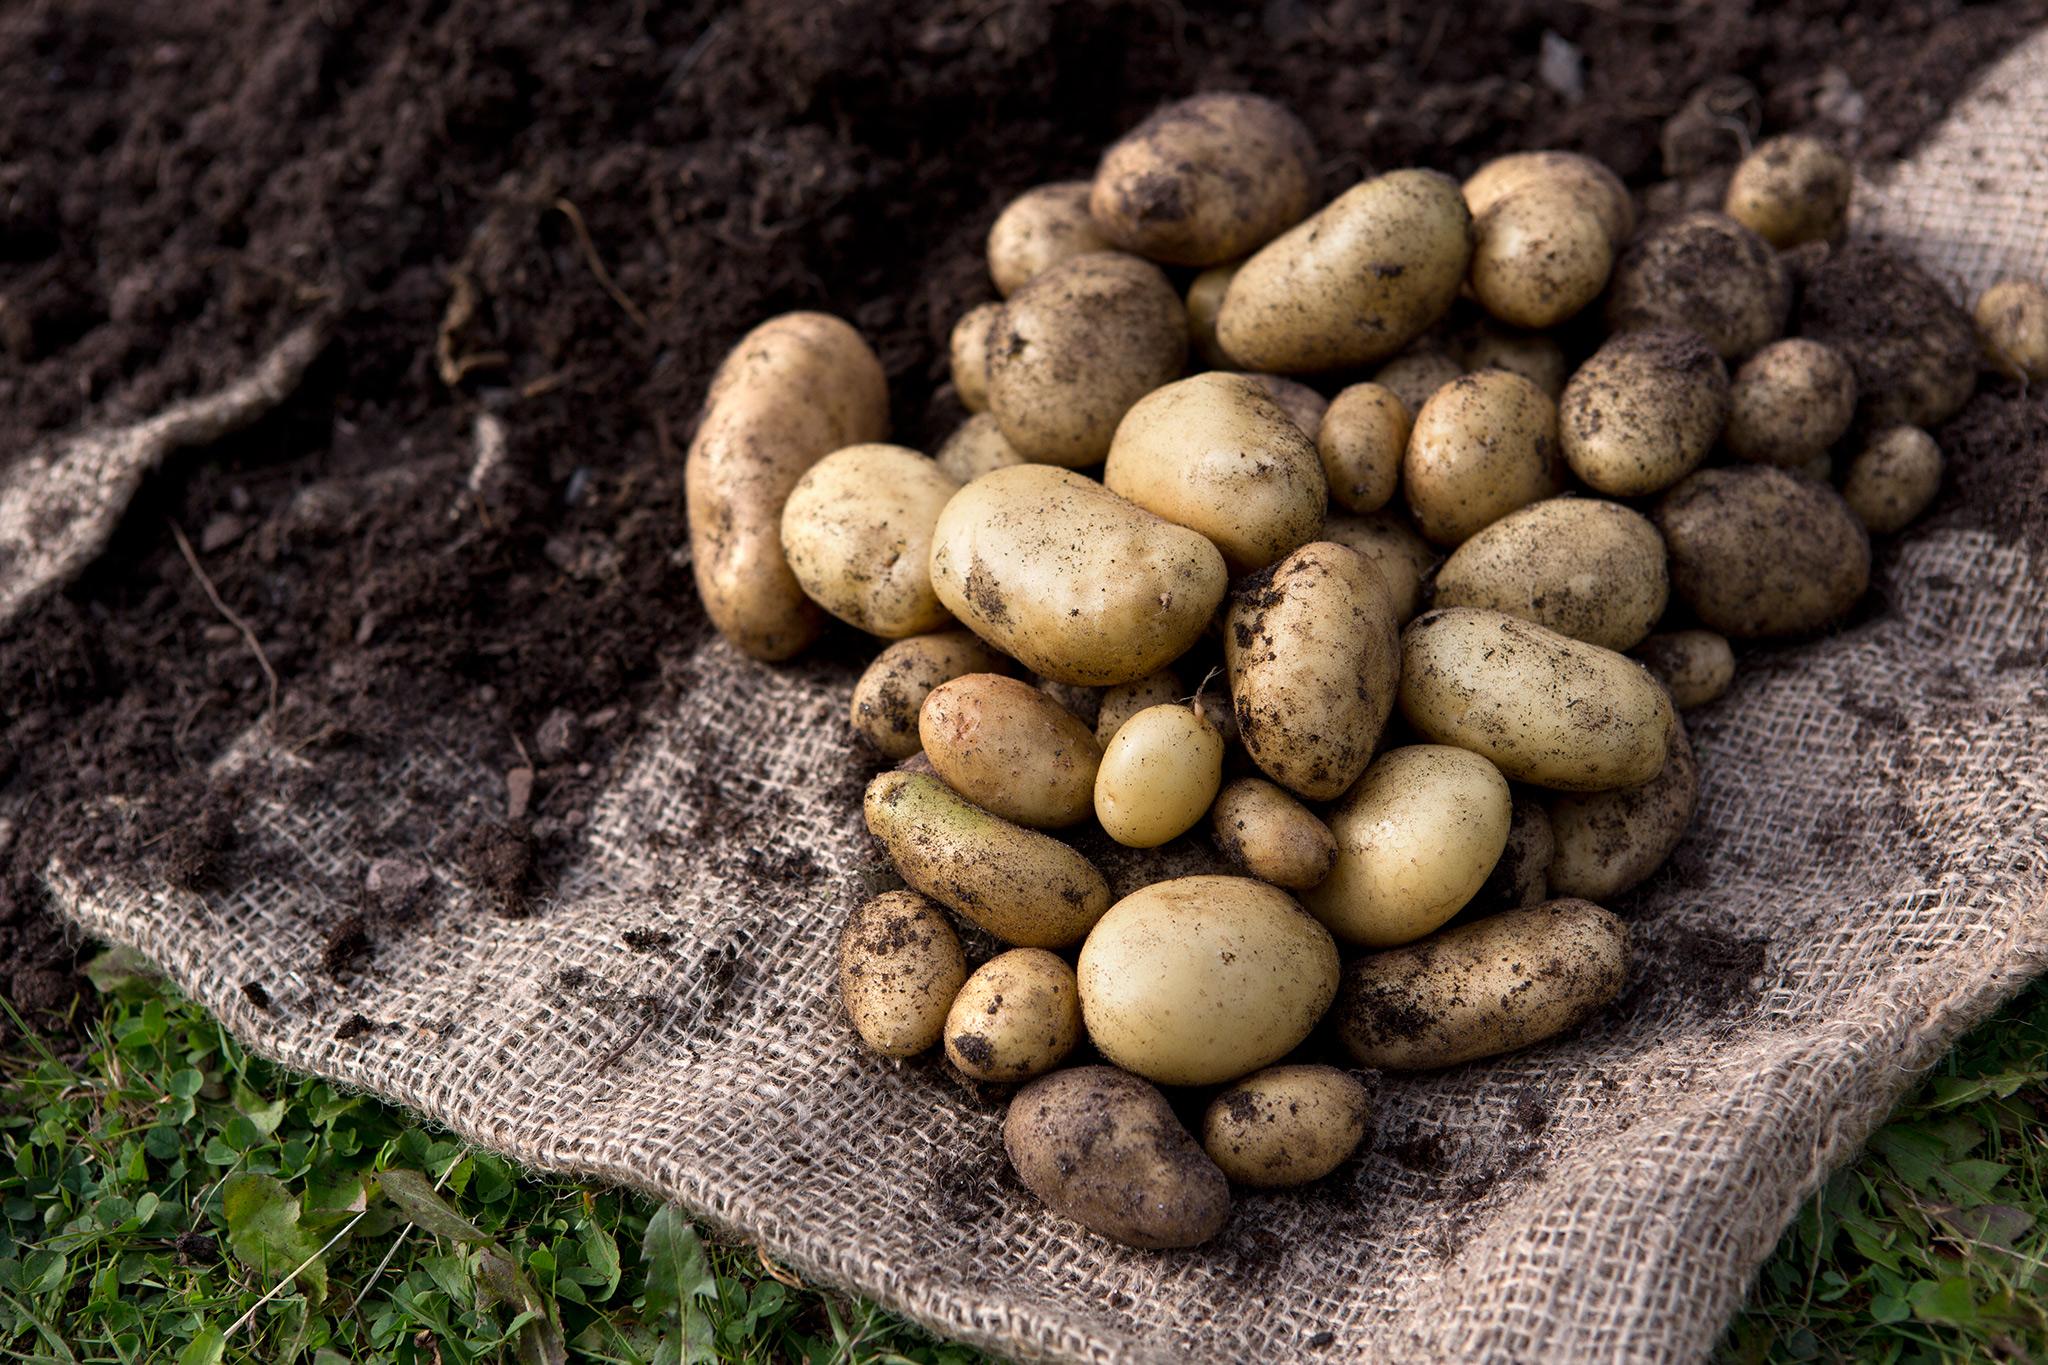 Allotment jobs in September - harvesting maincrop potatoes